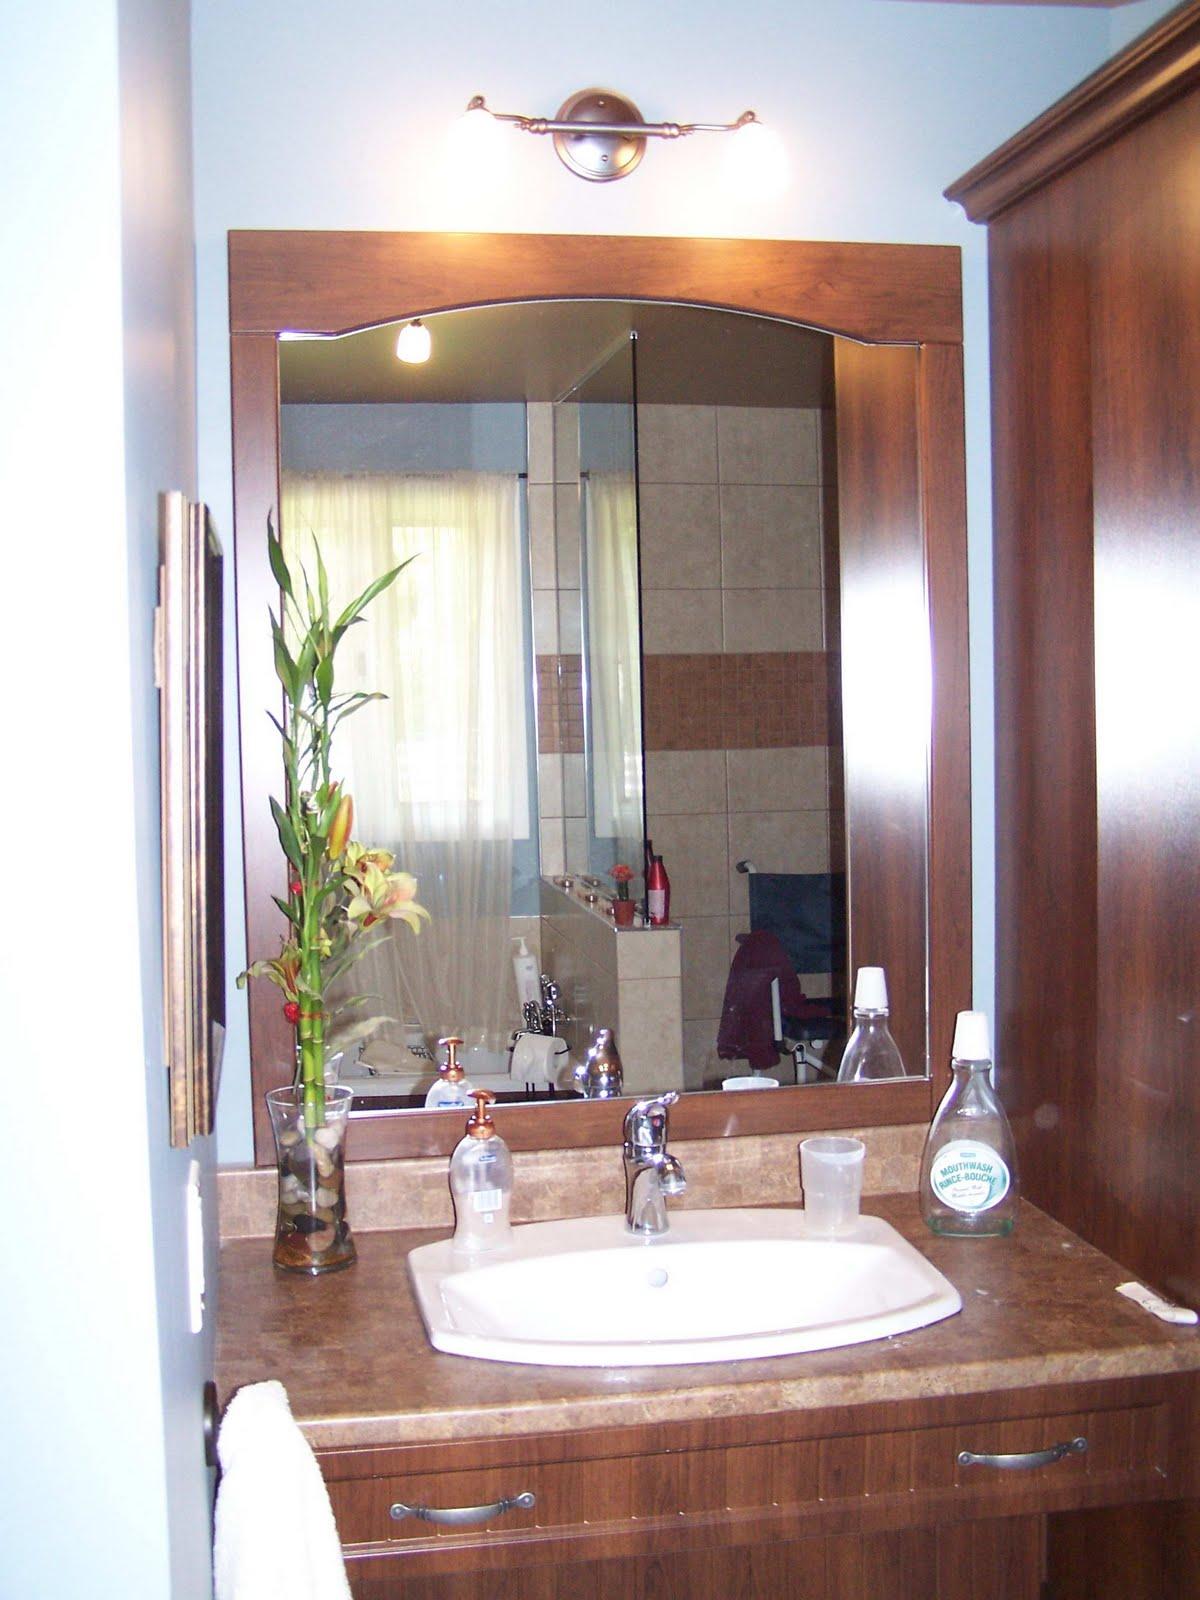 specialit smm armoire de salle de bain thermoplastique comptoir stratifi. Black Bedroom Furniture Sets. Home Design Ideas